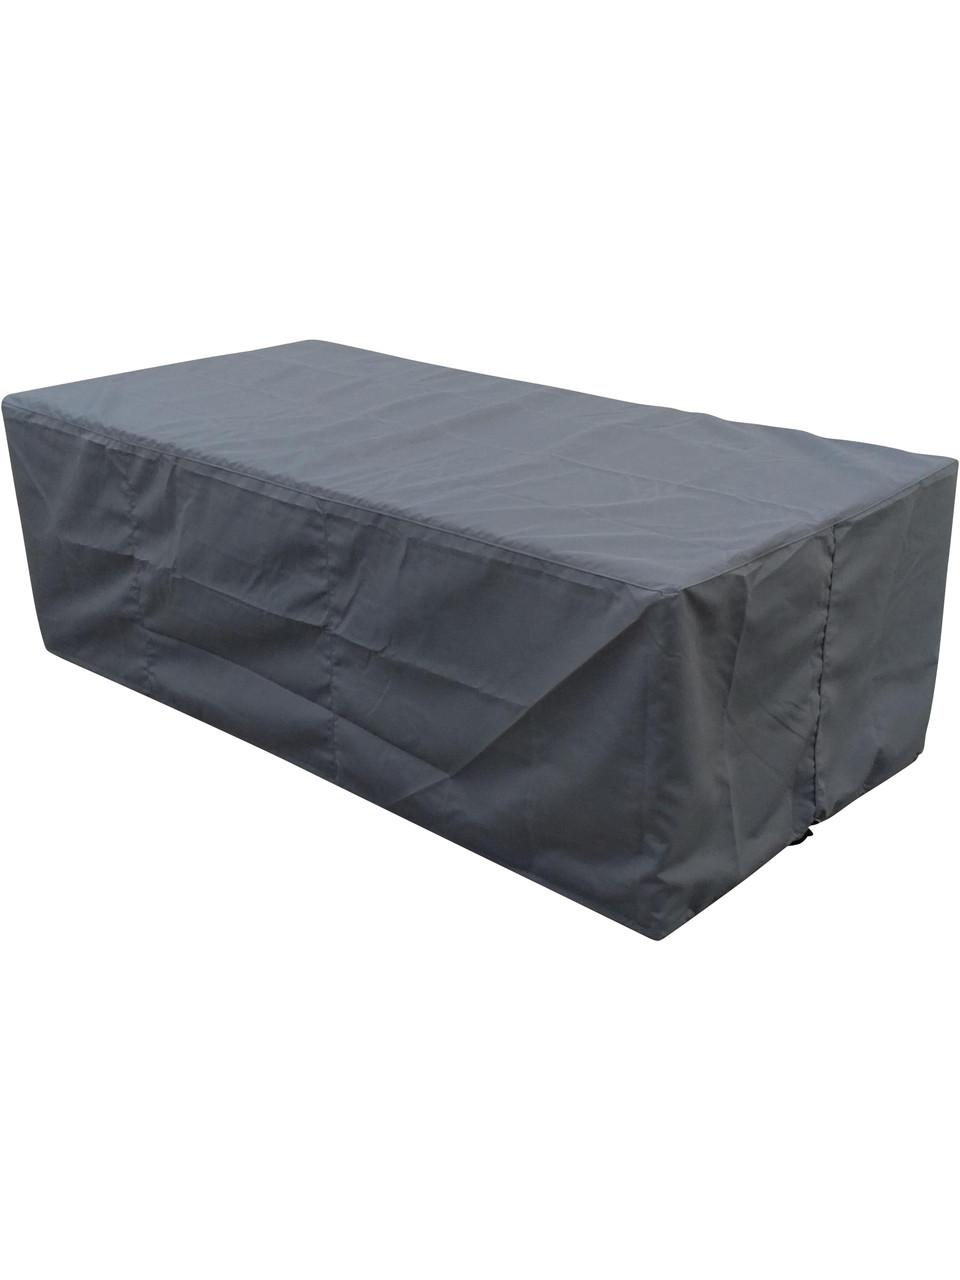 Bravo custom table cover